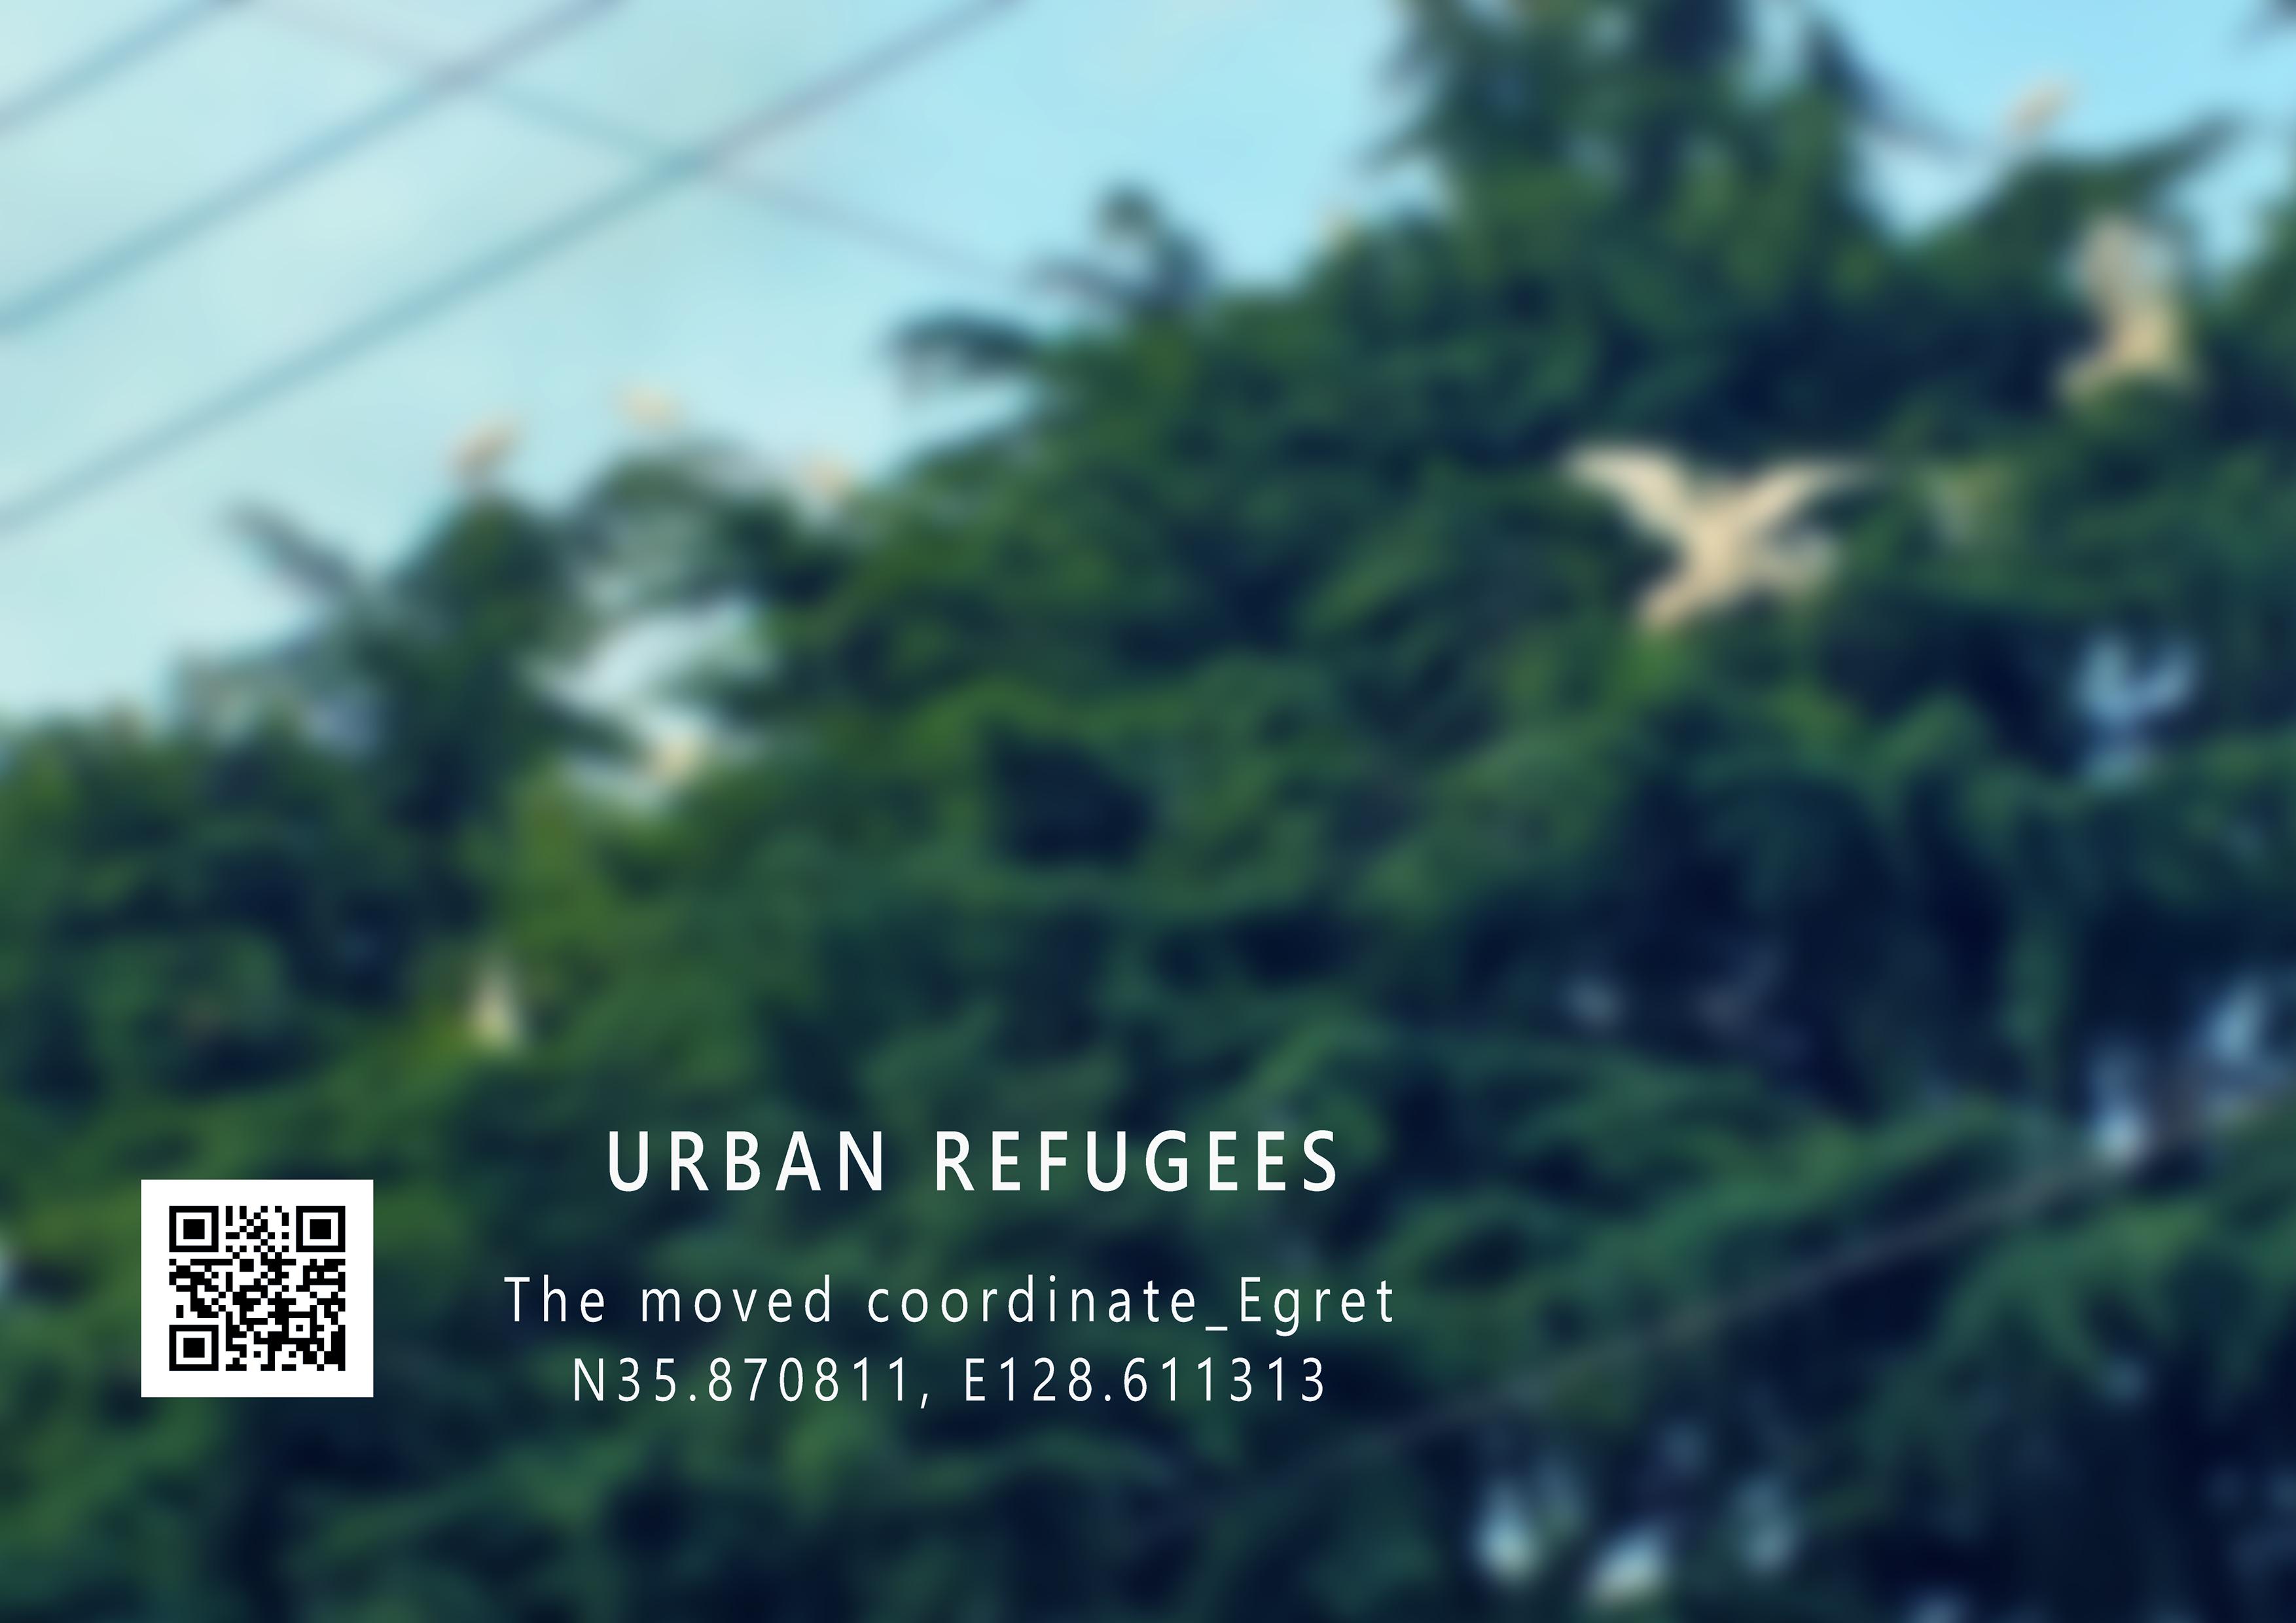 Urban refugees_2016